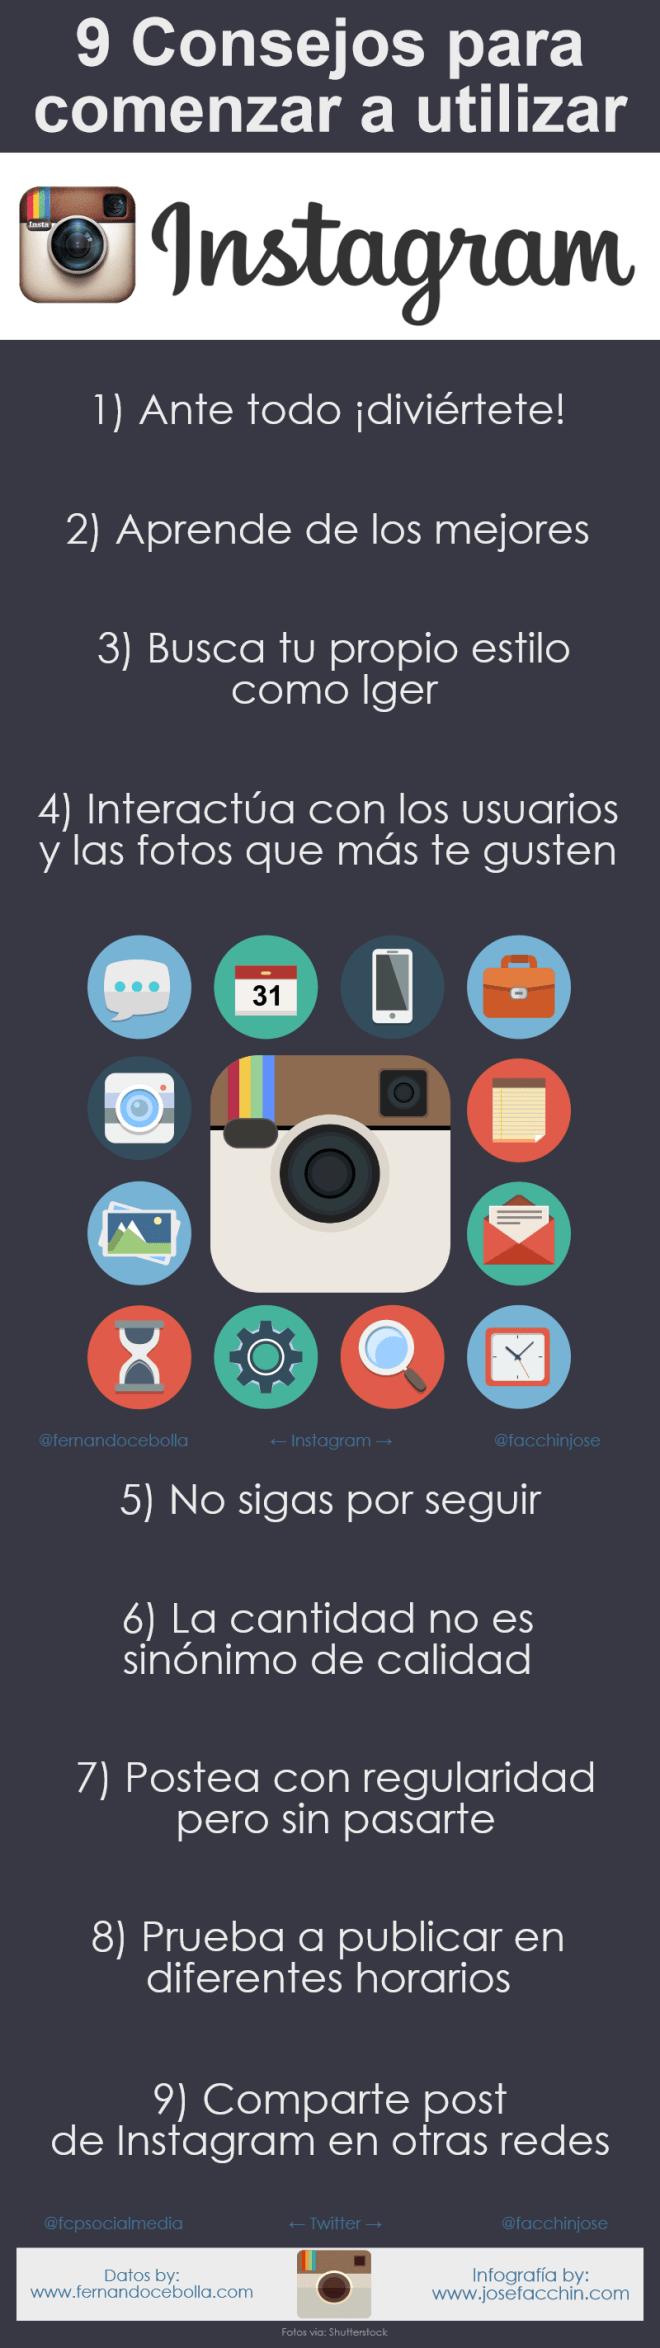 9 consejos para comenzar a usar Instagram